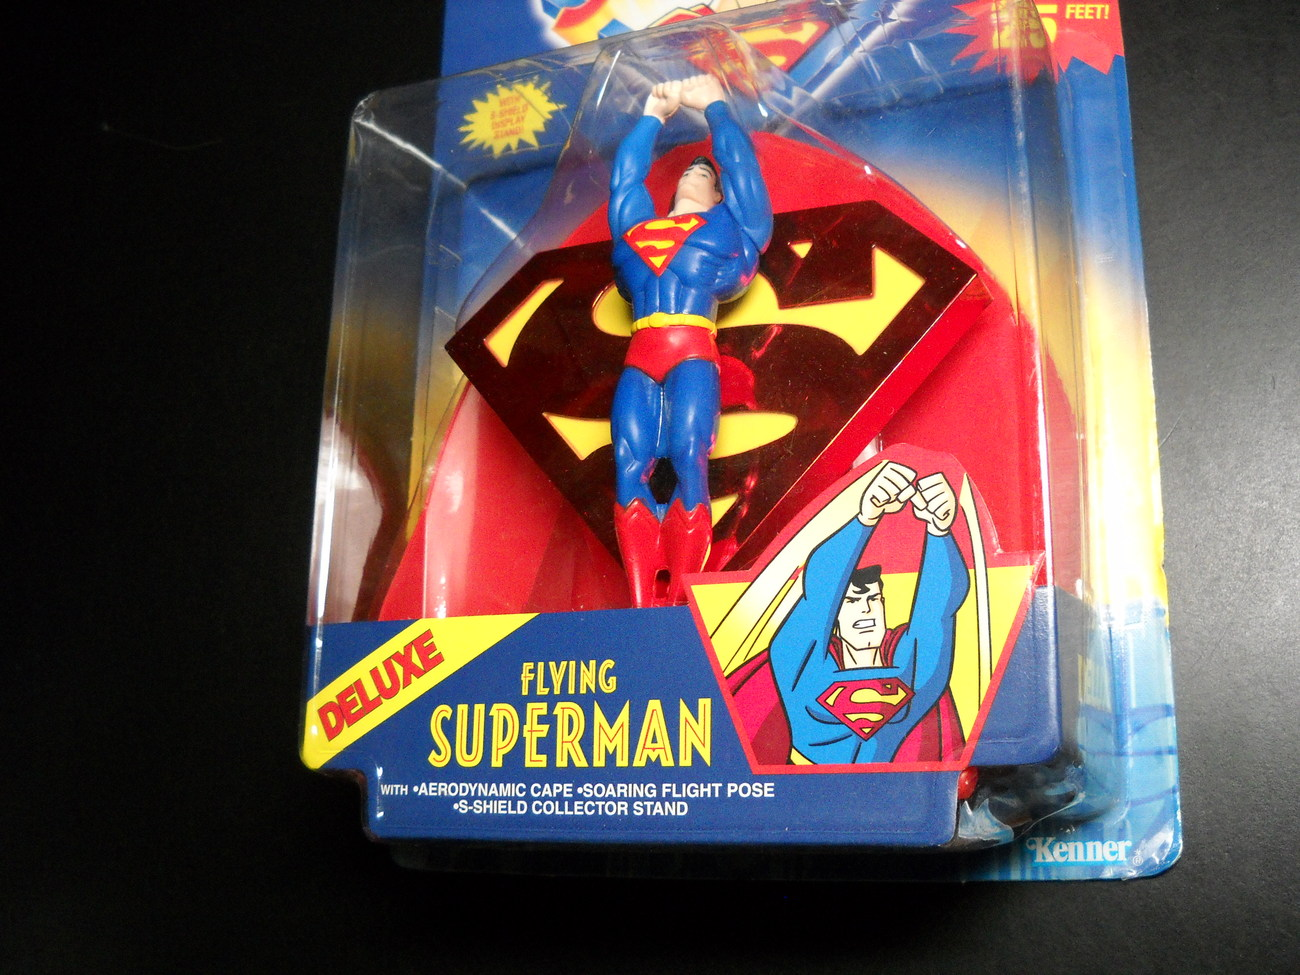 Kenner Hasbro Superman Animated Show Flying Superman 1996 Kenner Hasbro Sealed